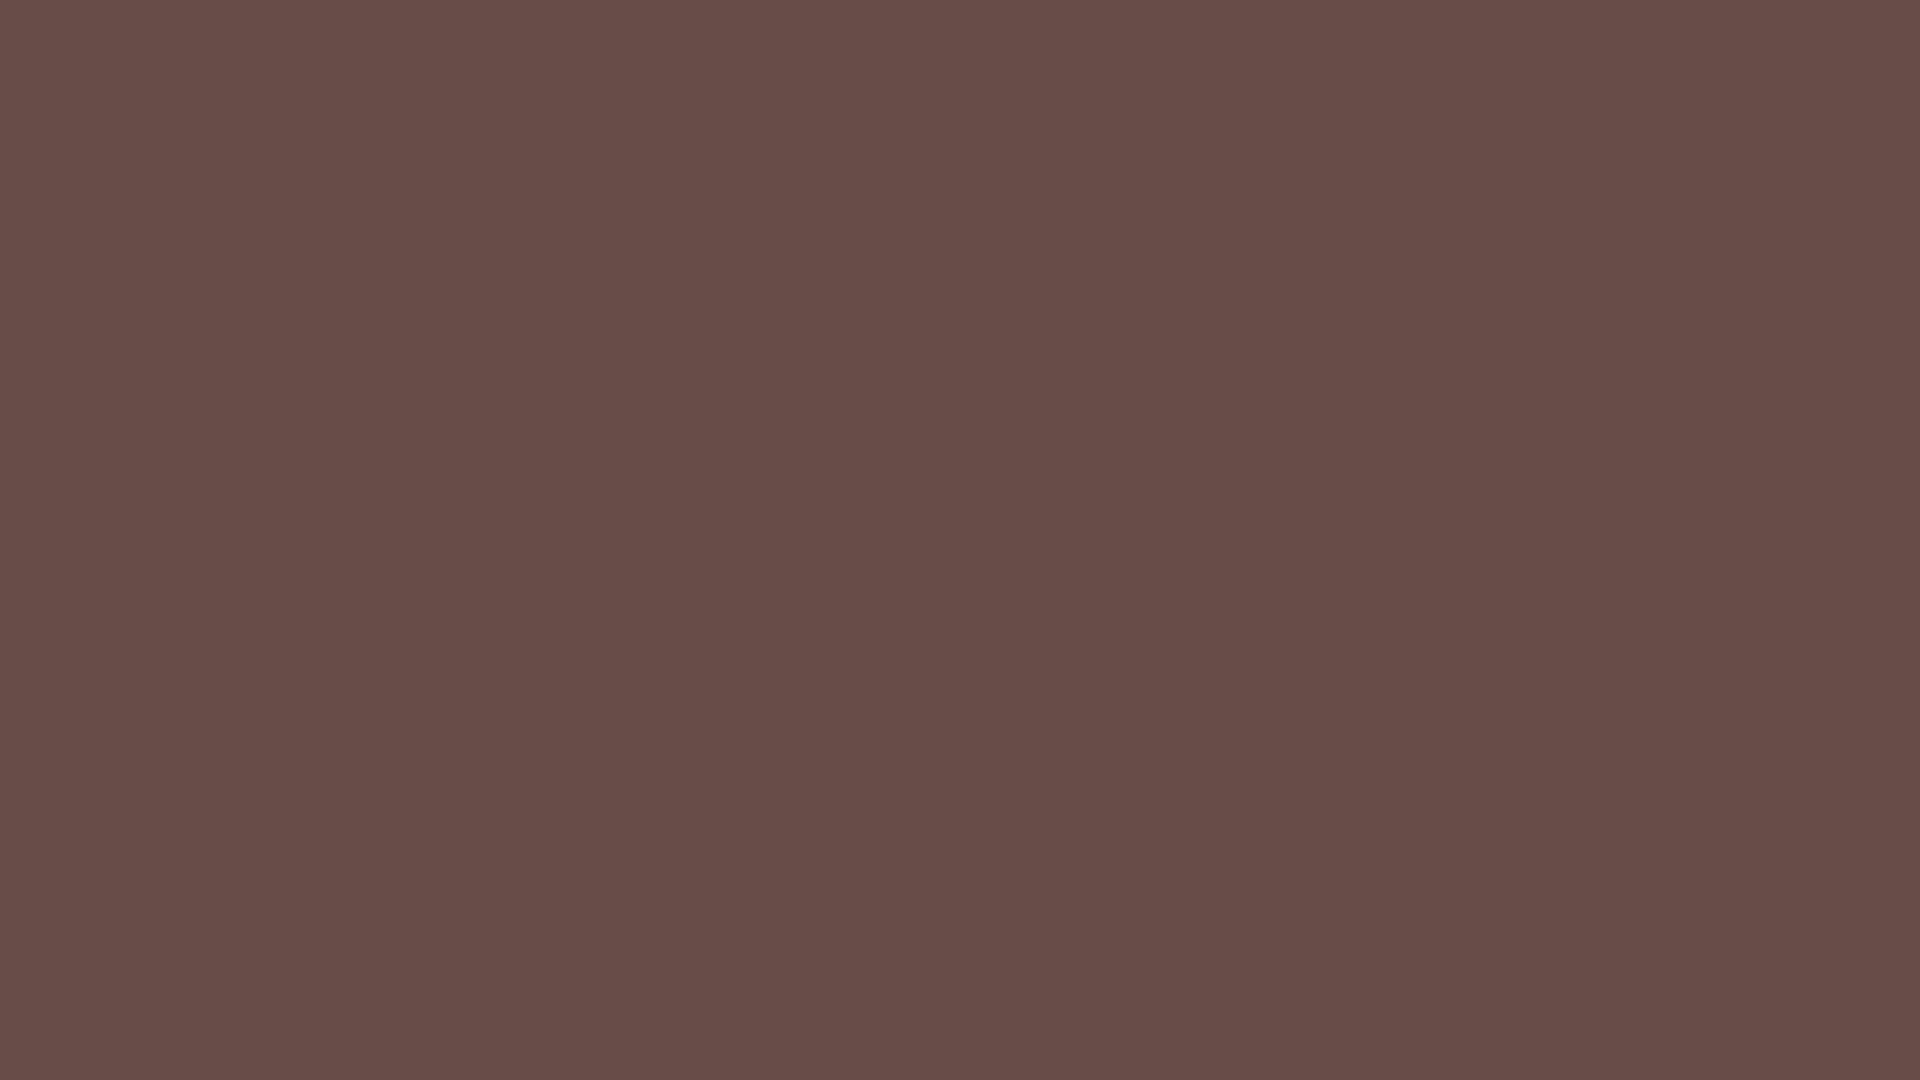 1920x1080 Liver Solid Color Background